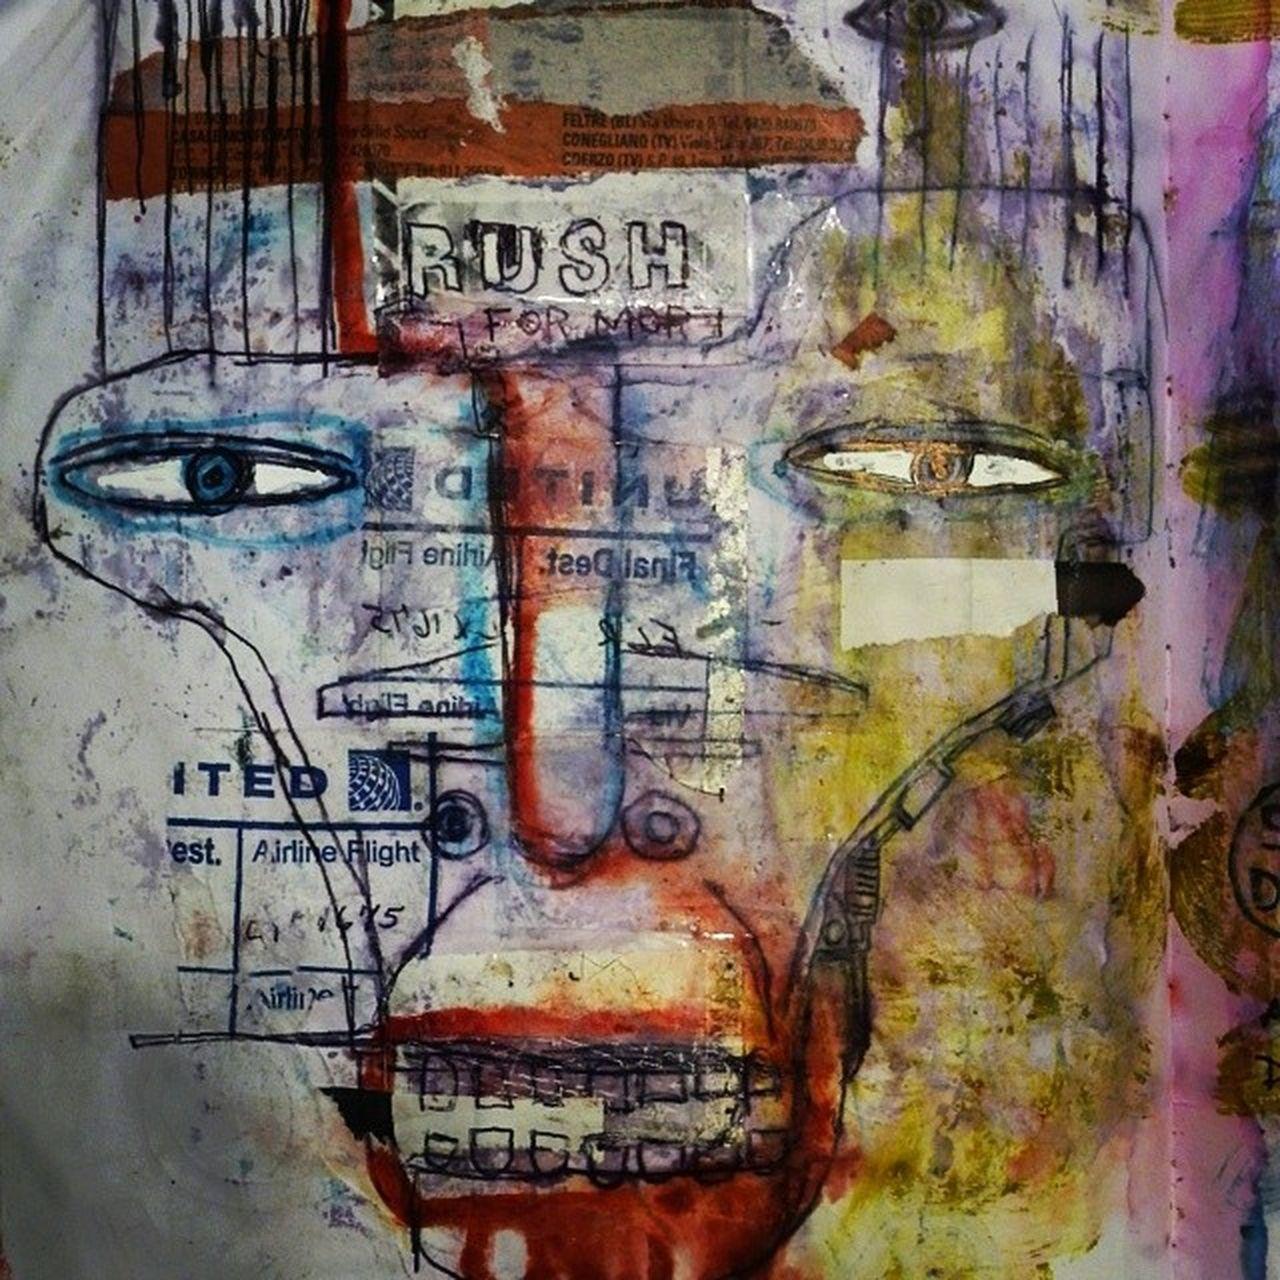 graffiti, weathered, text, abandoned, no people, rusty, close-up, day